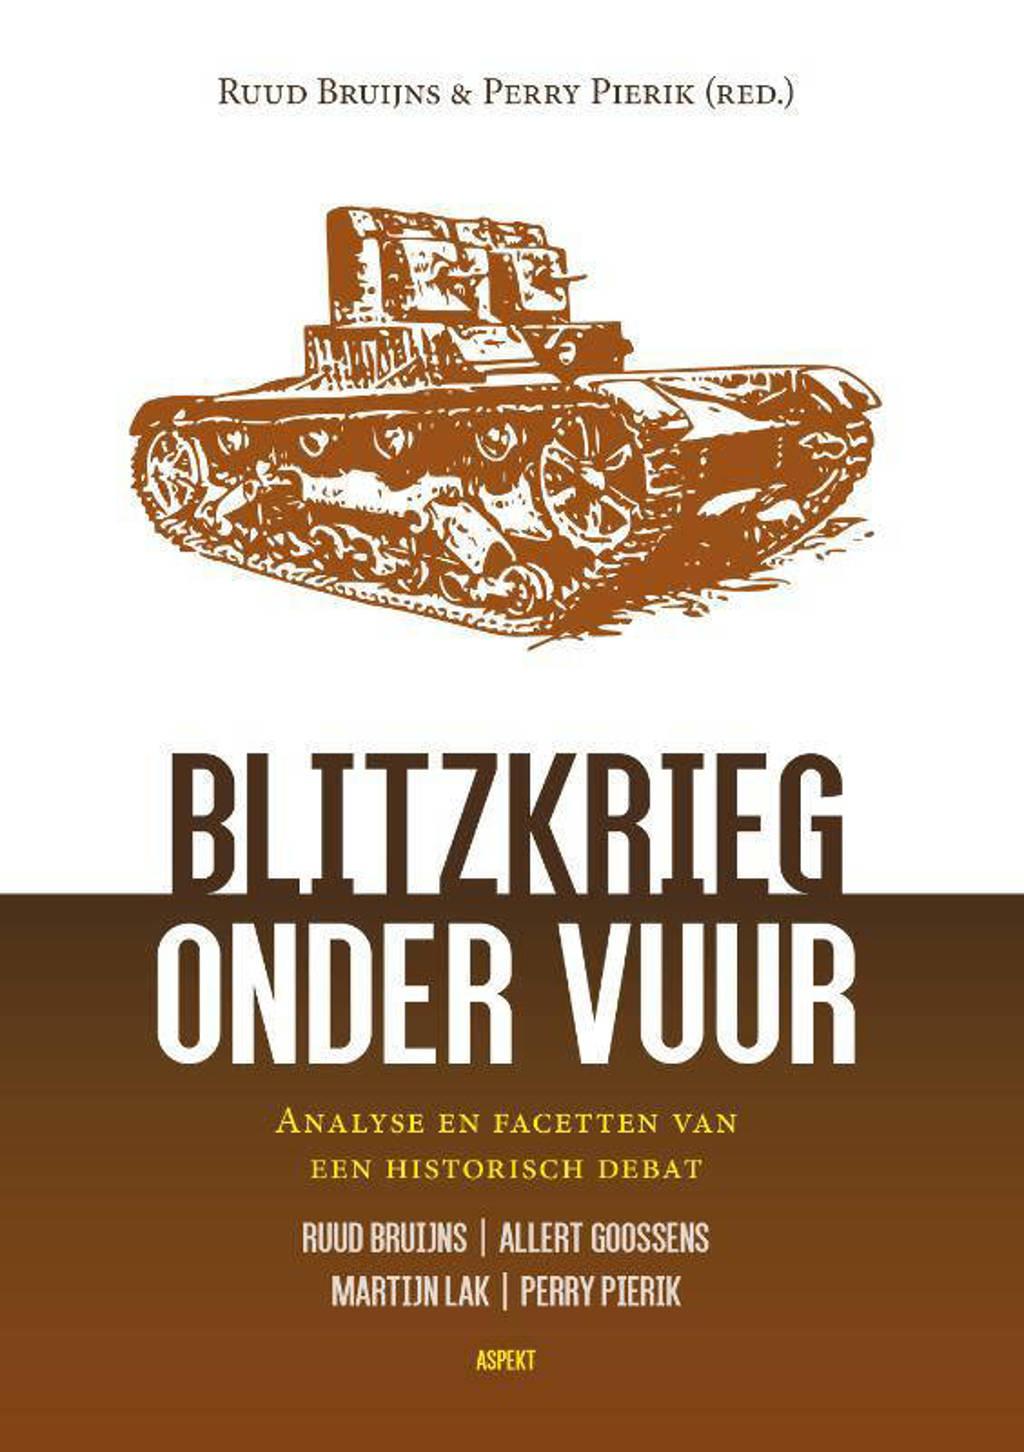 Blitzkrieg onder vuur - Ruud Bruijns en Perry Pierik